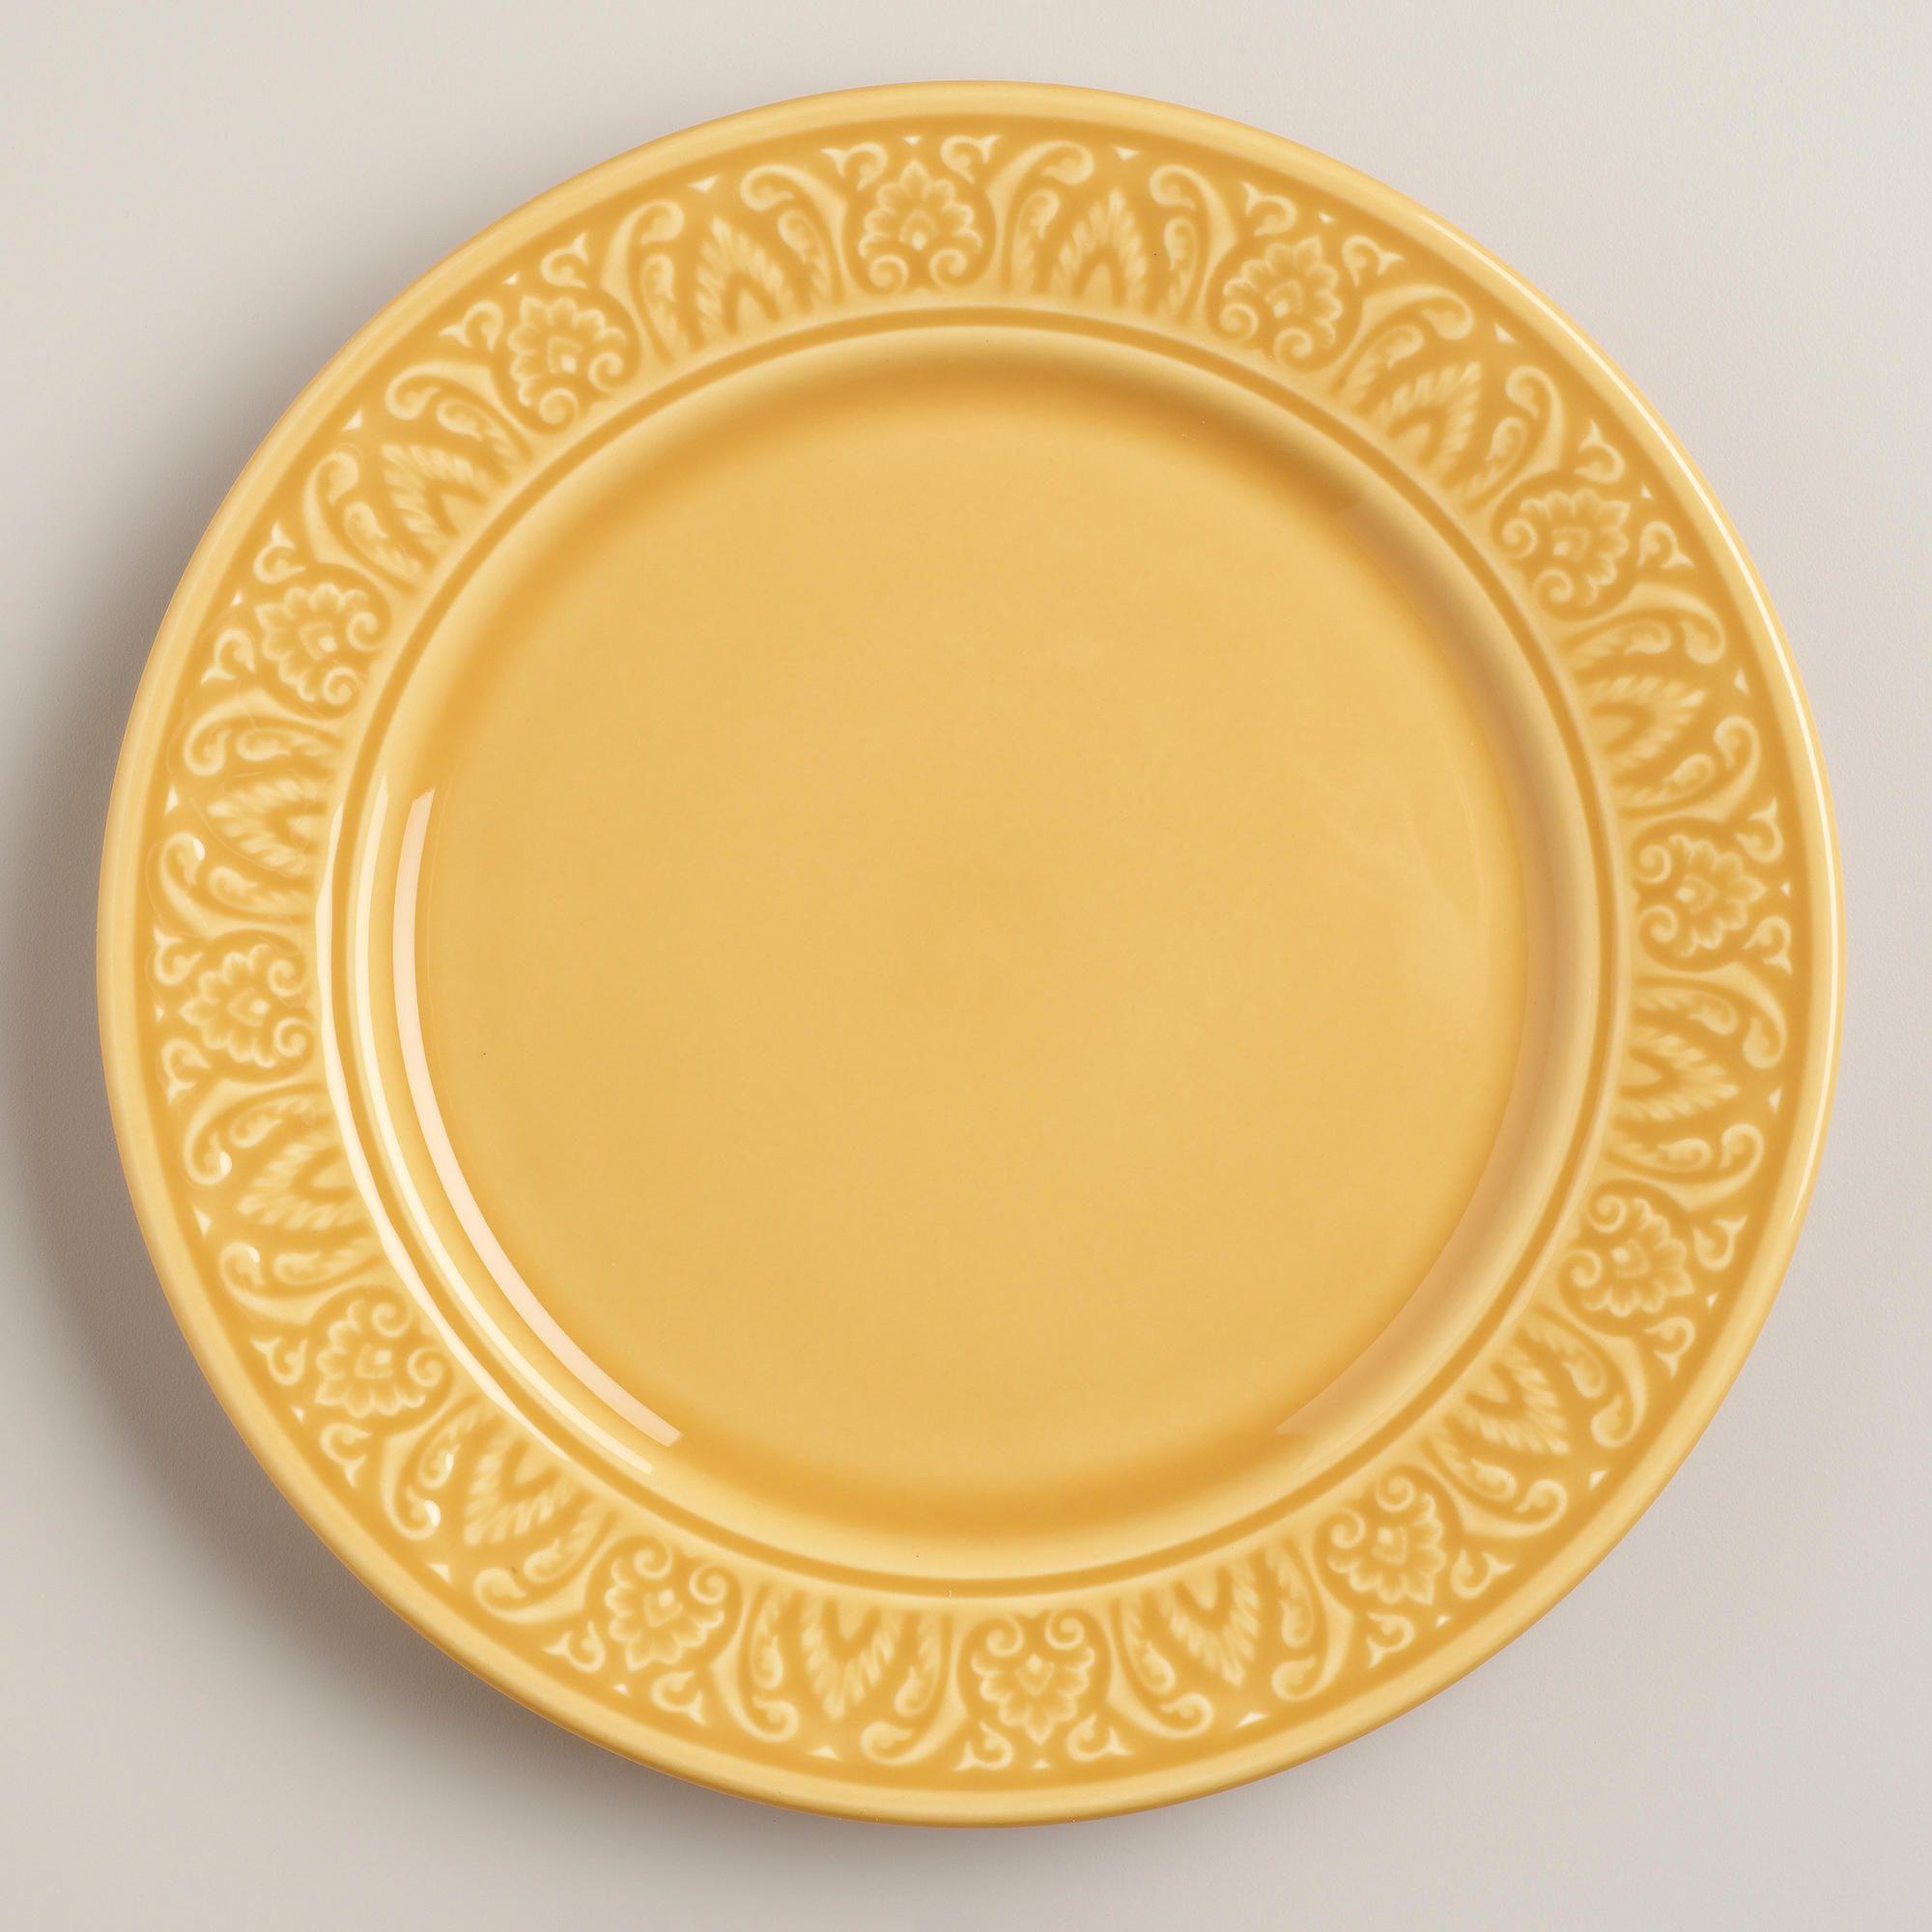 Amber Salad Plates, Set of 4 | World Market